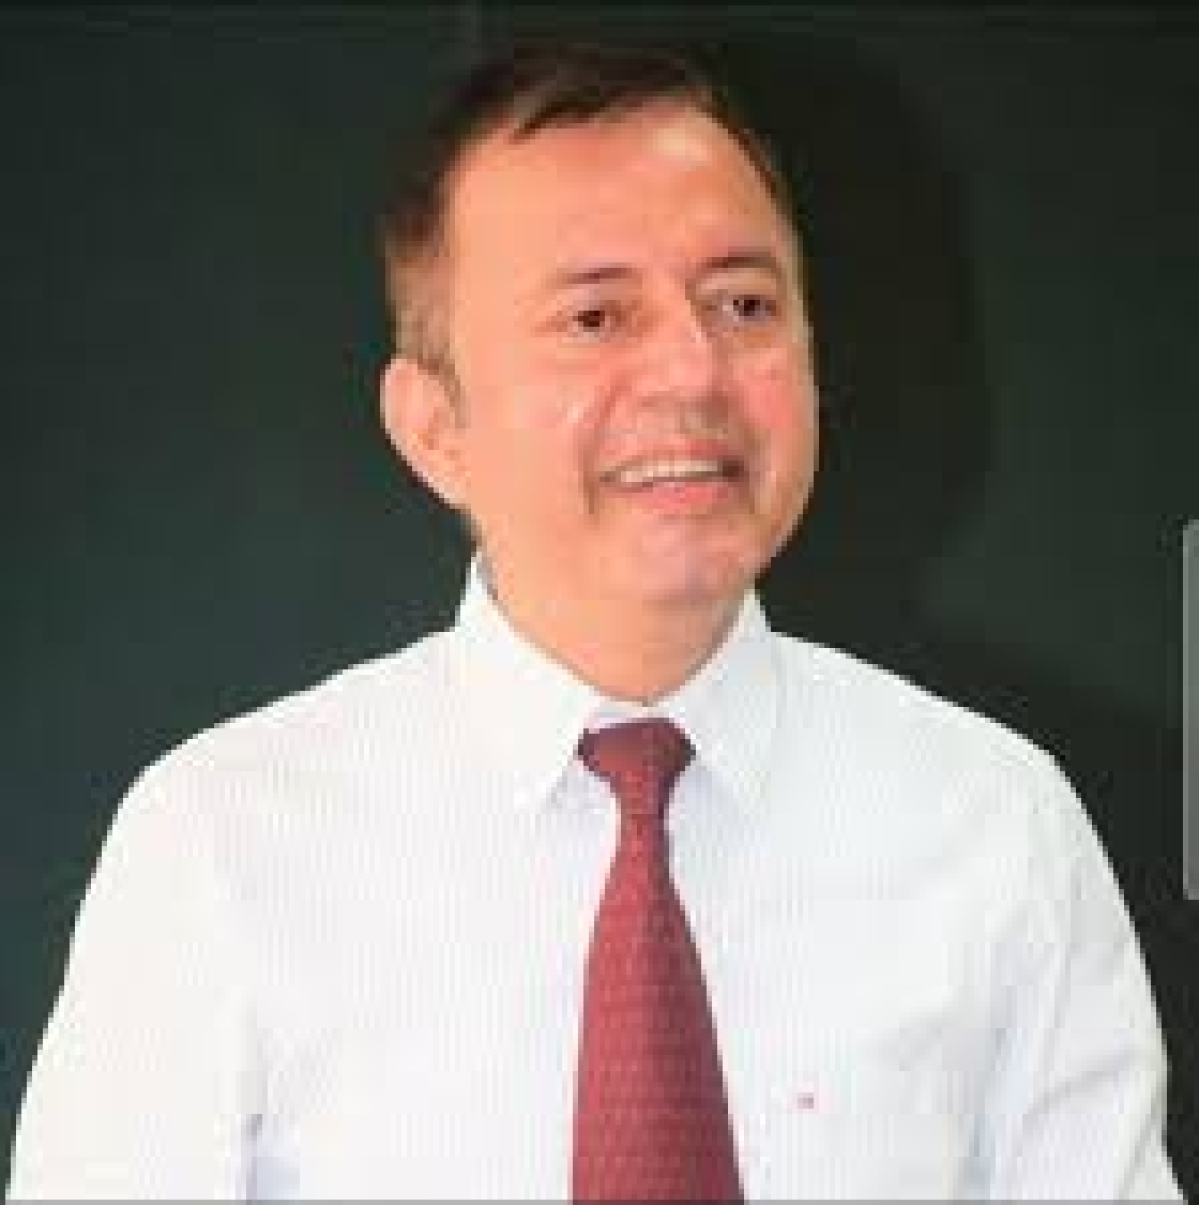 IIM Indore director Prof Himanshu Rai